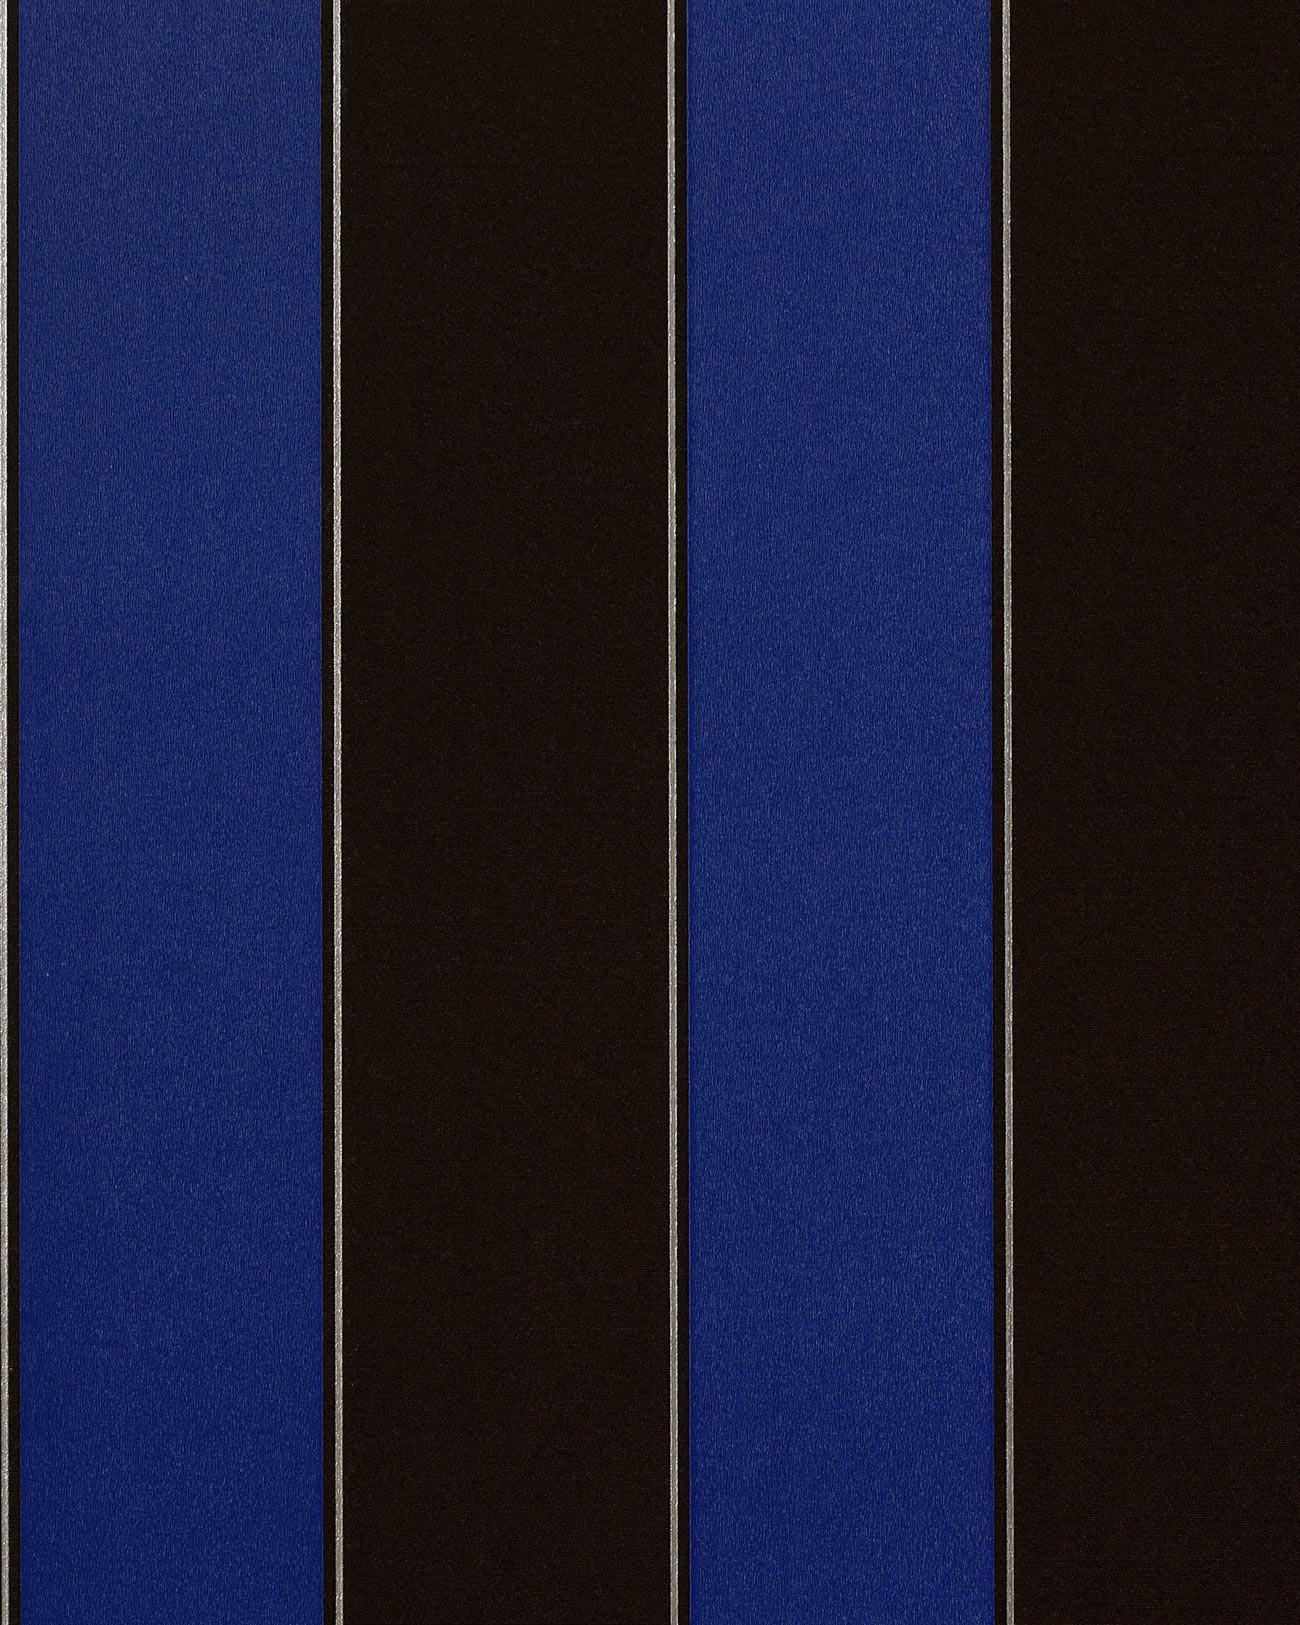 streifen tapete edem 771 37 vinyl tapete luxus hochwertig barock dunkel braun royal blau silber. Black Bedroom Furniture Sets. Home Design Ideas